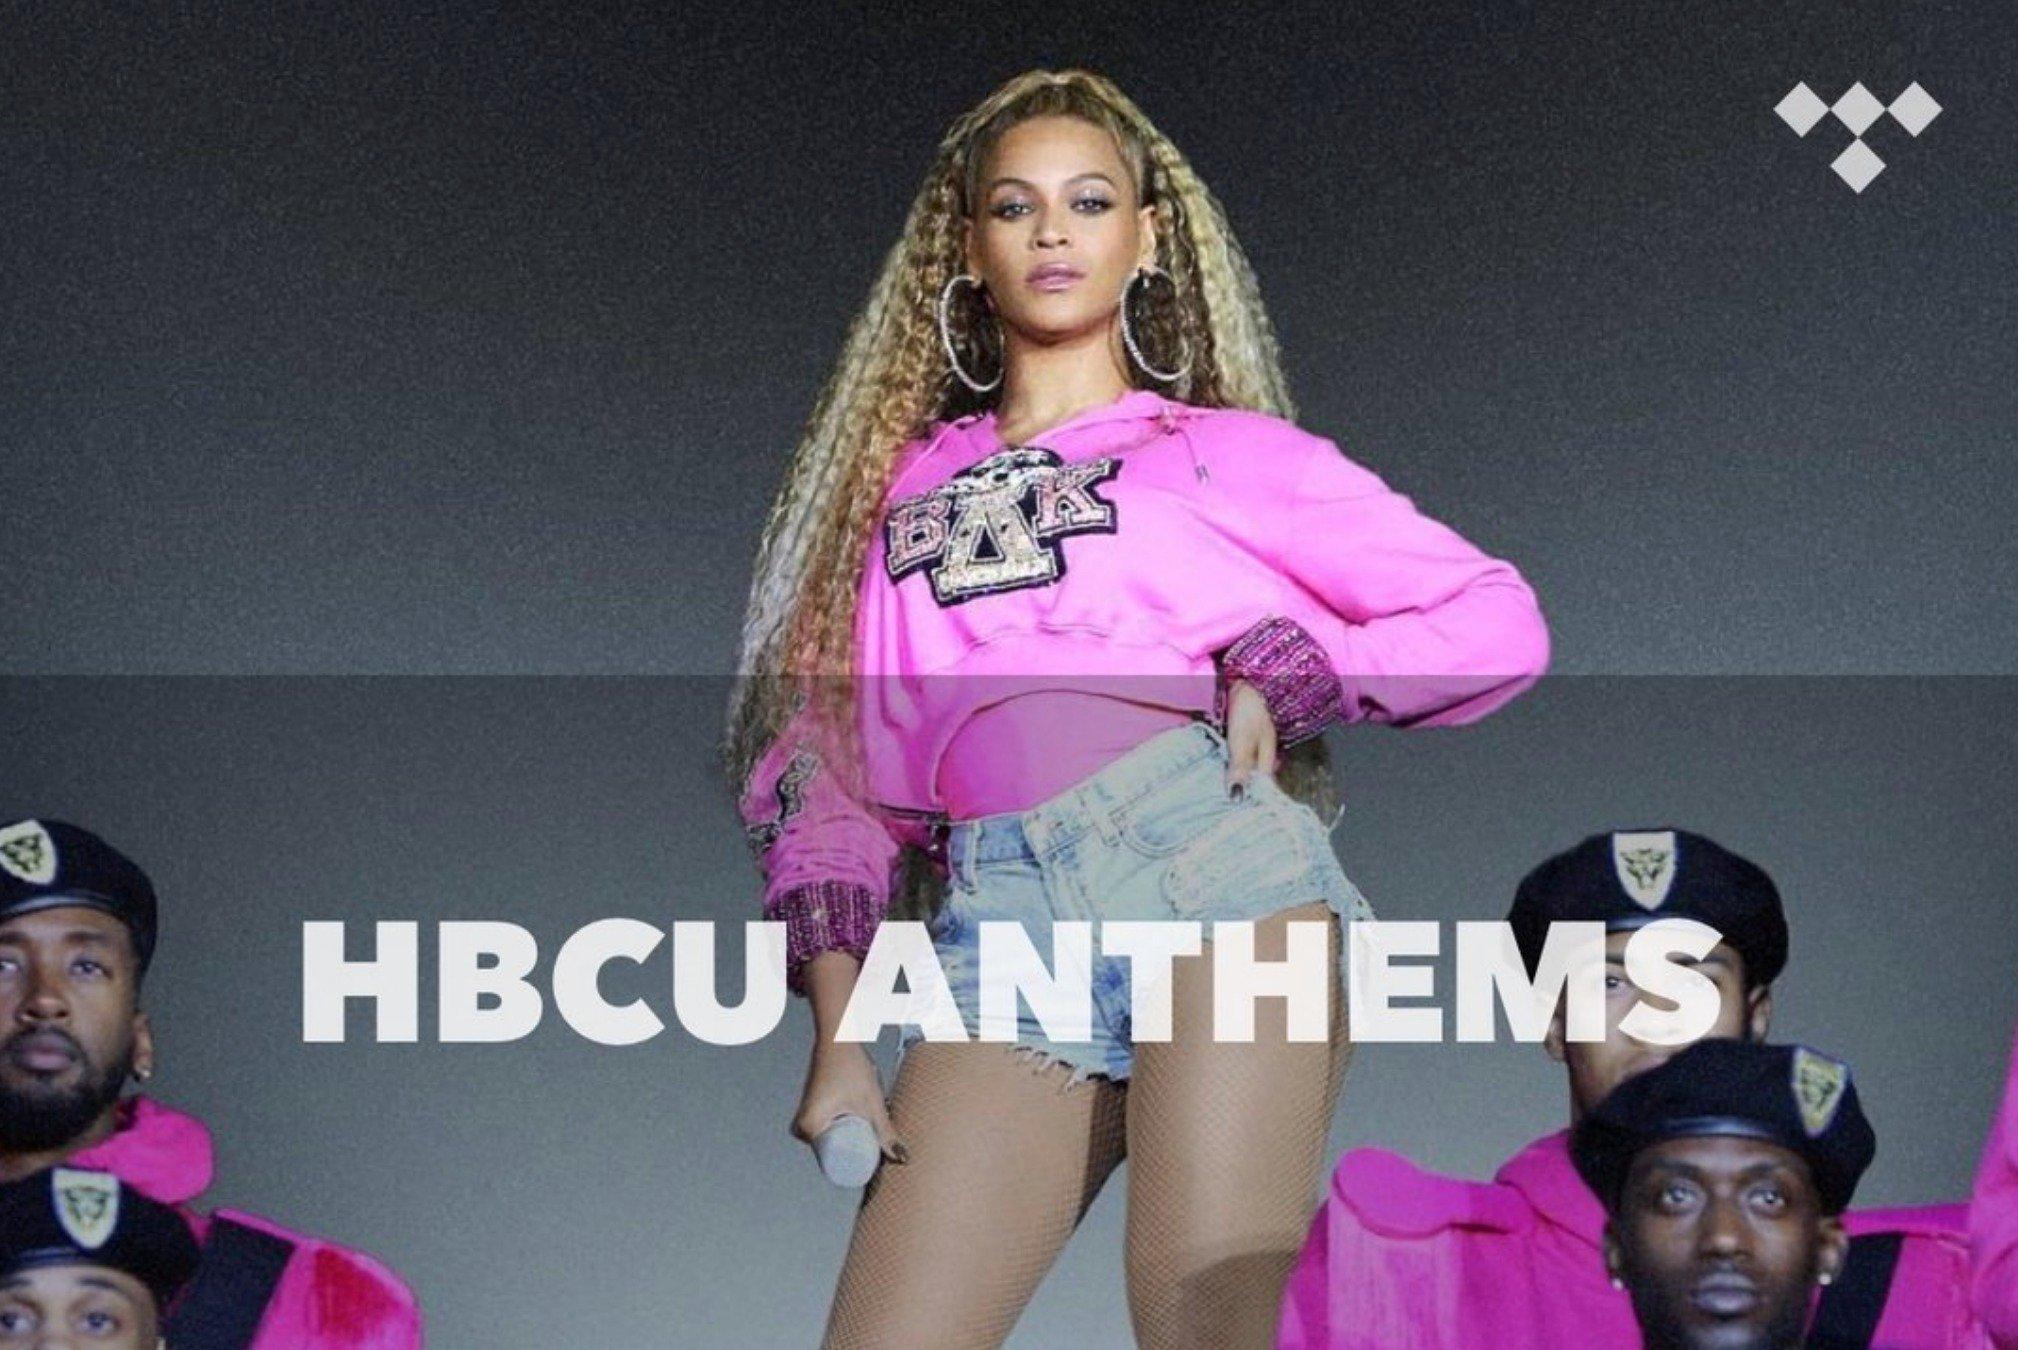 Classic playlist! HBCU Anthems https://t.co/W83ILdtvv1 #TIDAL https://t.co/R7MrzulVqK